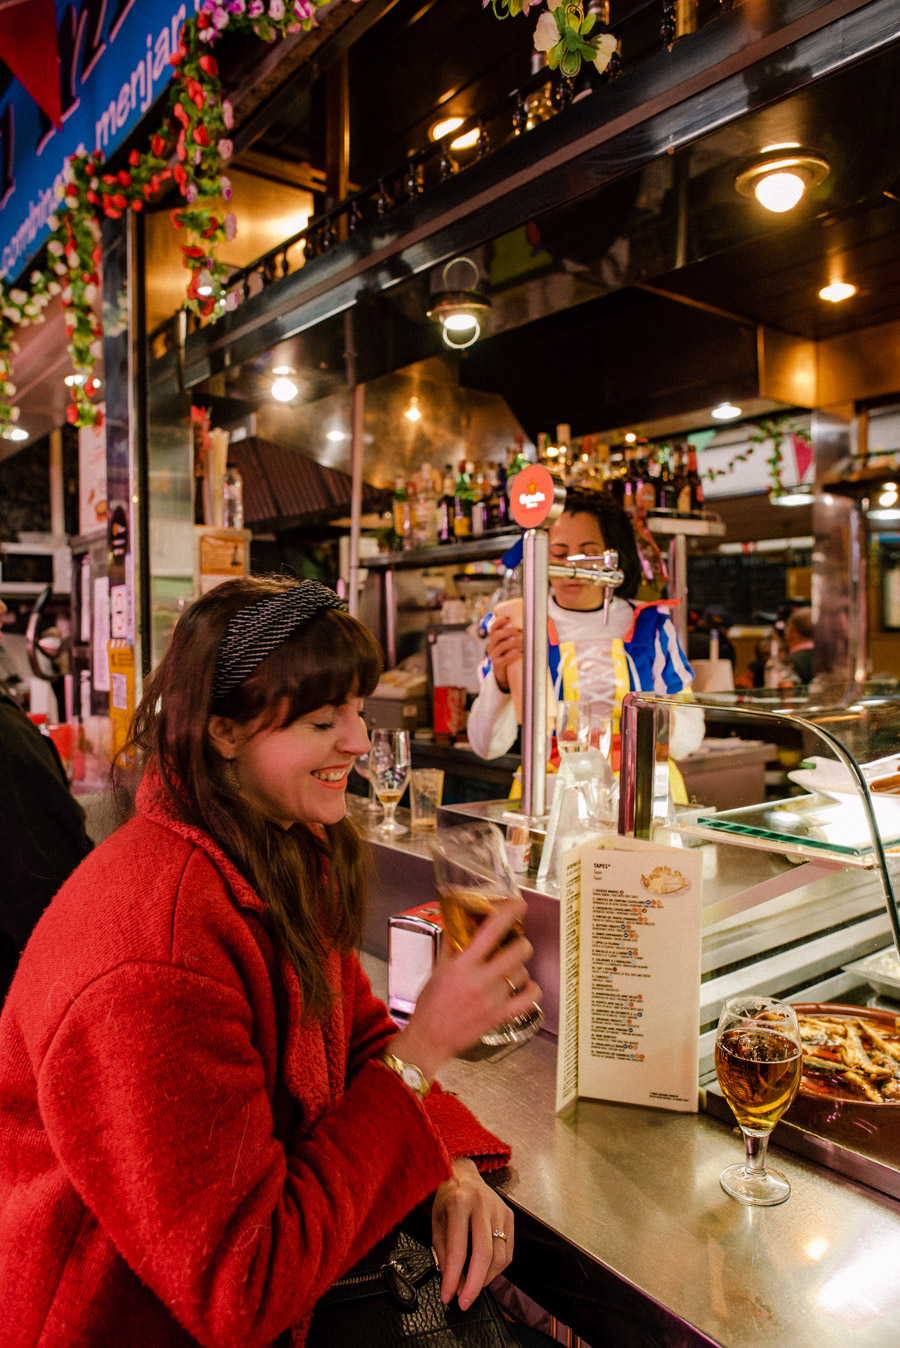 Enjoying a caña at a bar is a fun local experience in Barcelona